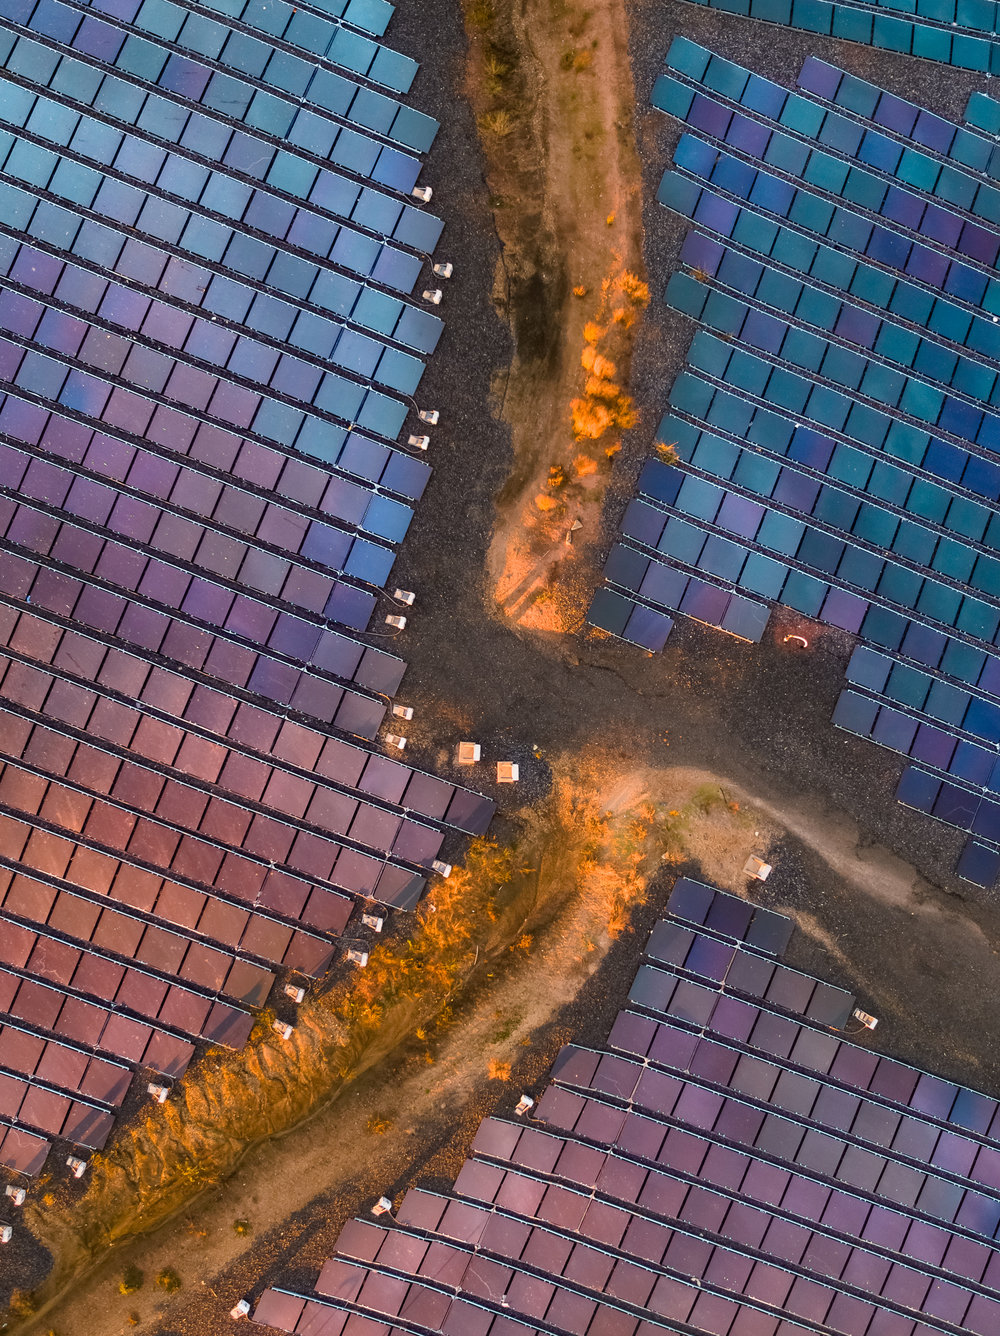 solarcity_typoland_aerial-1.jpg